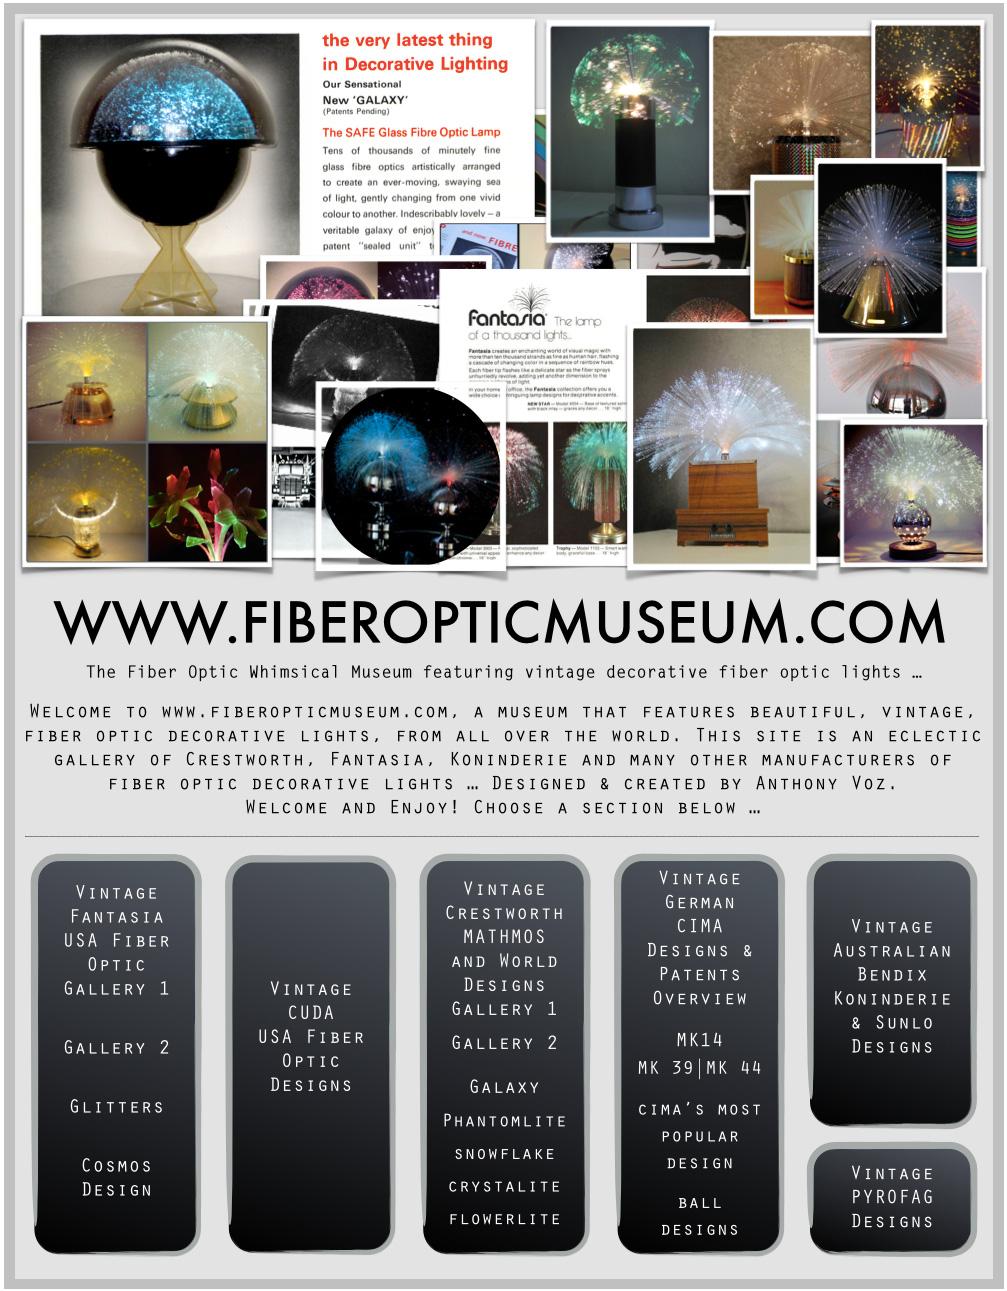 Welcome To Www Fiberopticmuseum Com Mini Index A Site Dedicated To